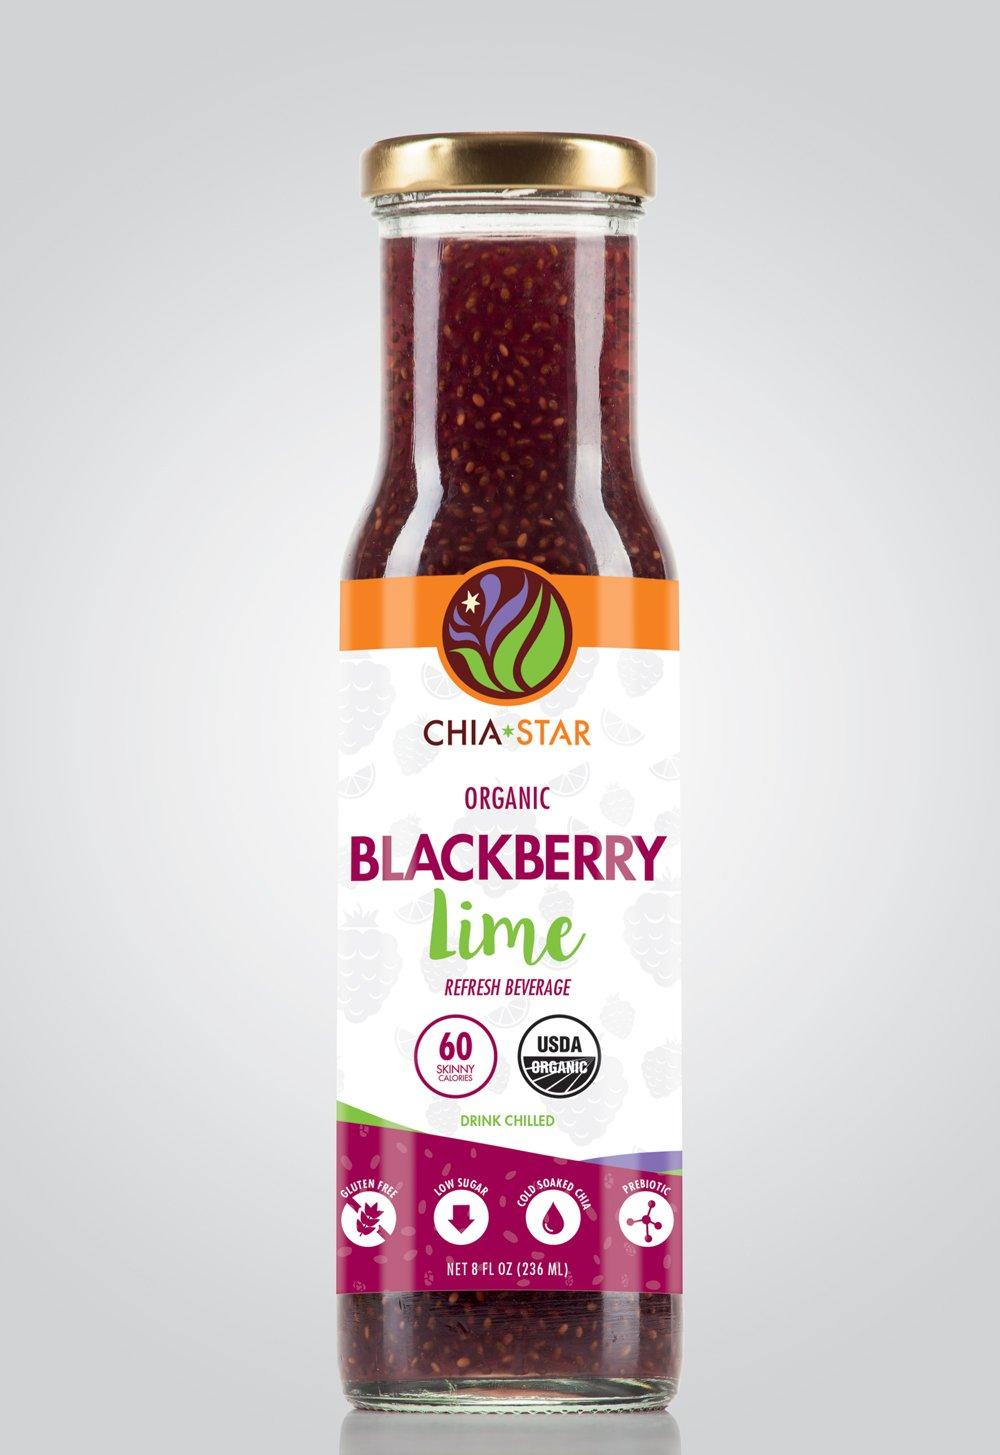 Chia Star Blackberry Lime Refresh three 8 oz bottles